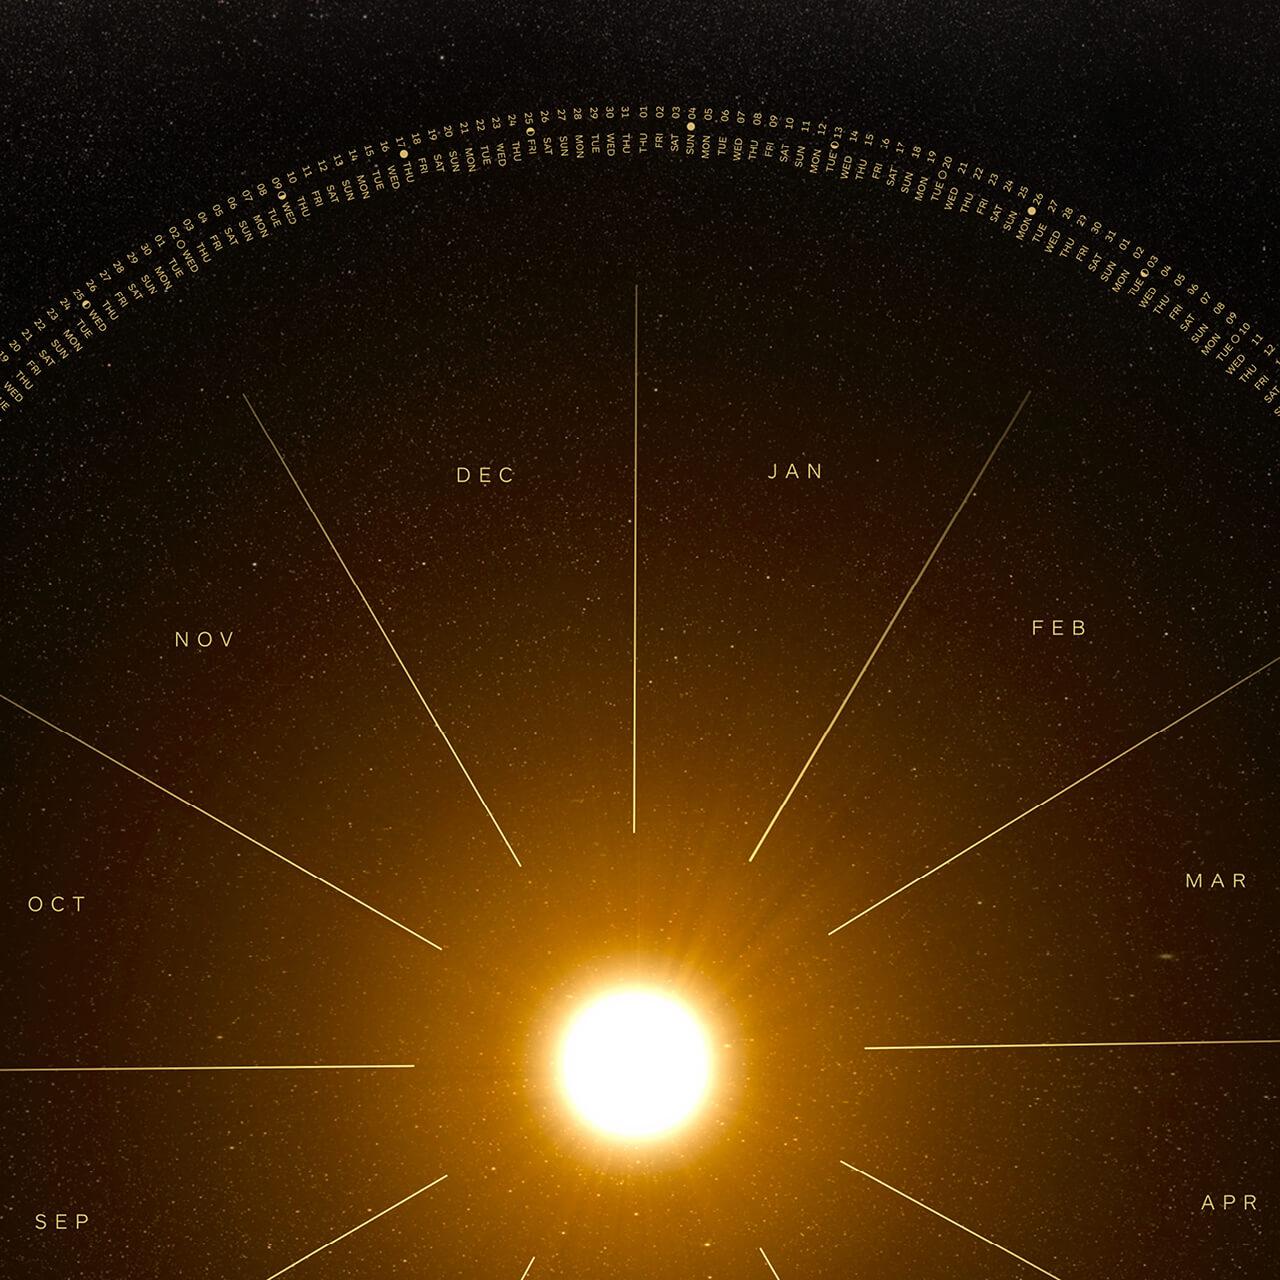 solarcalendar-2016-detail2